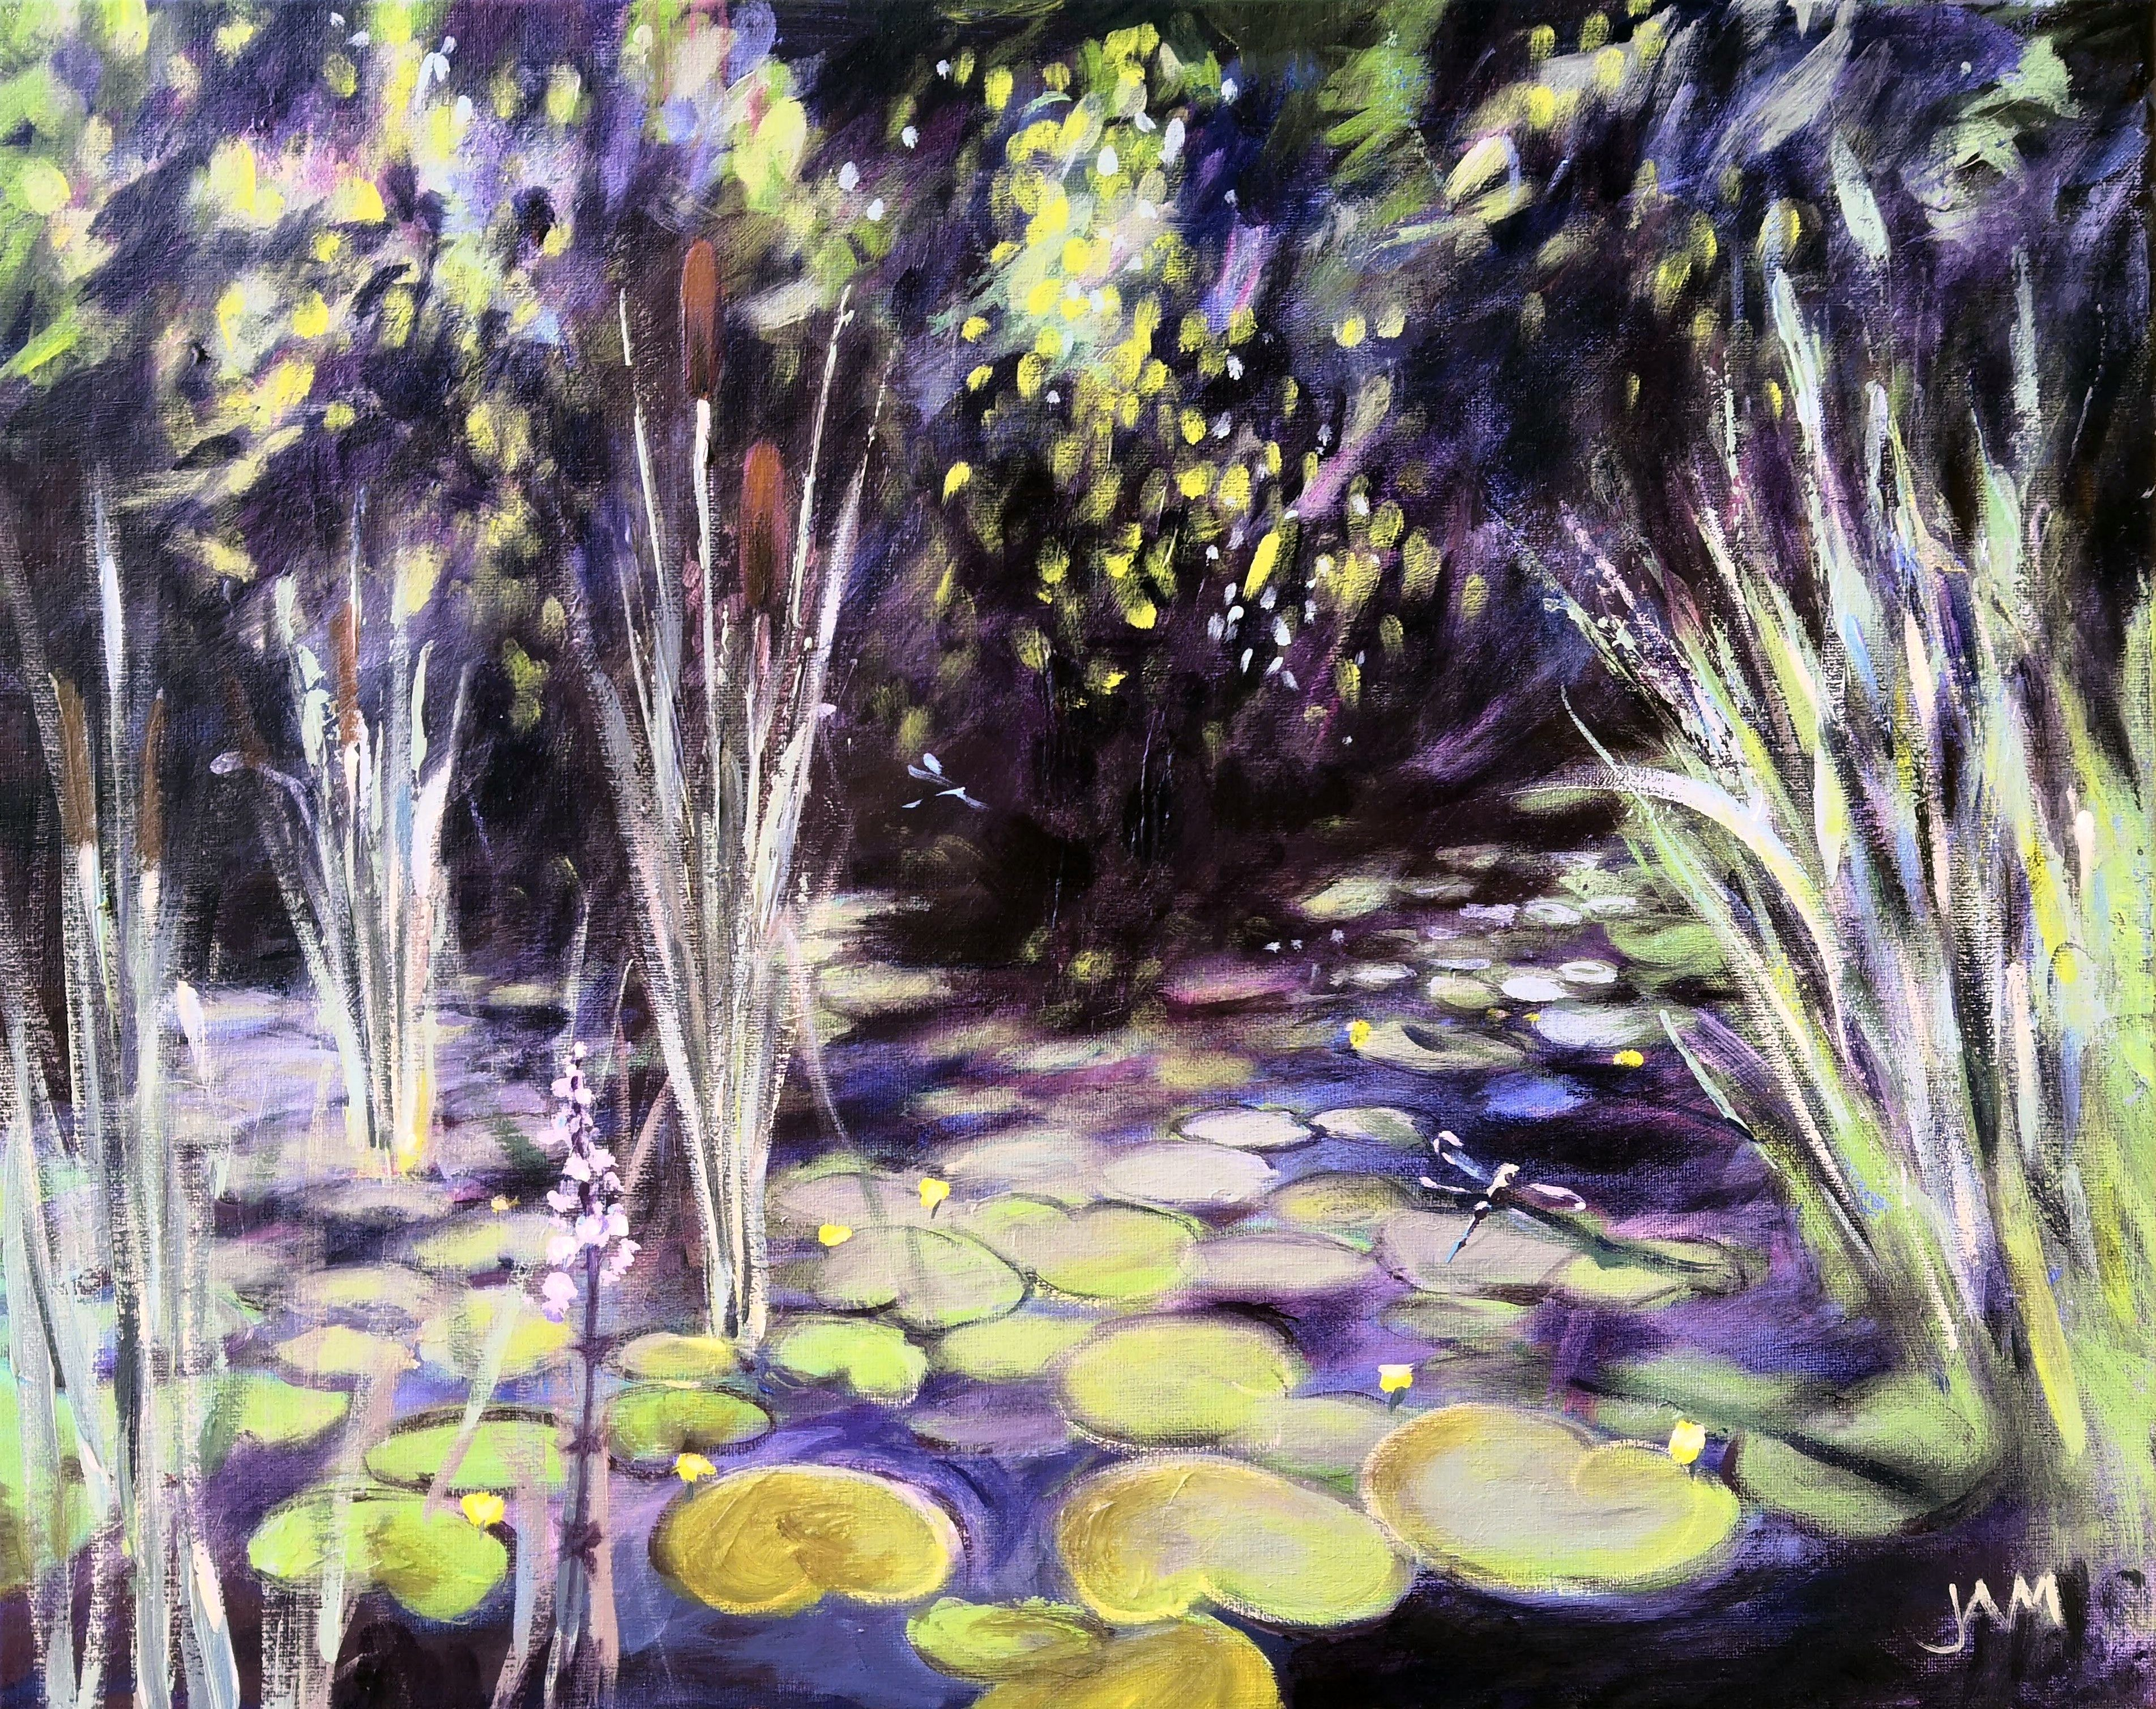 Lilypads & Dragonflies